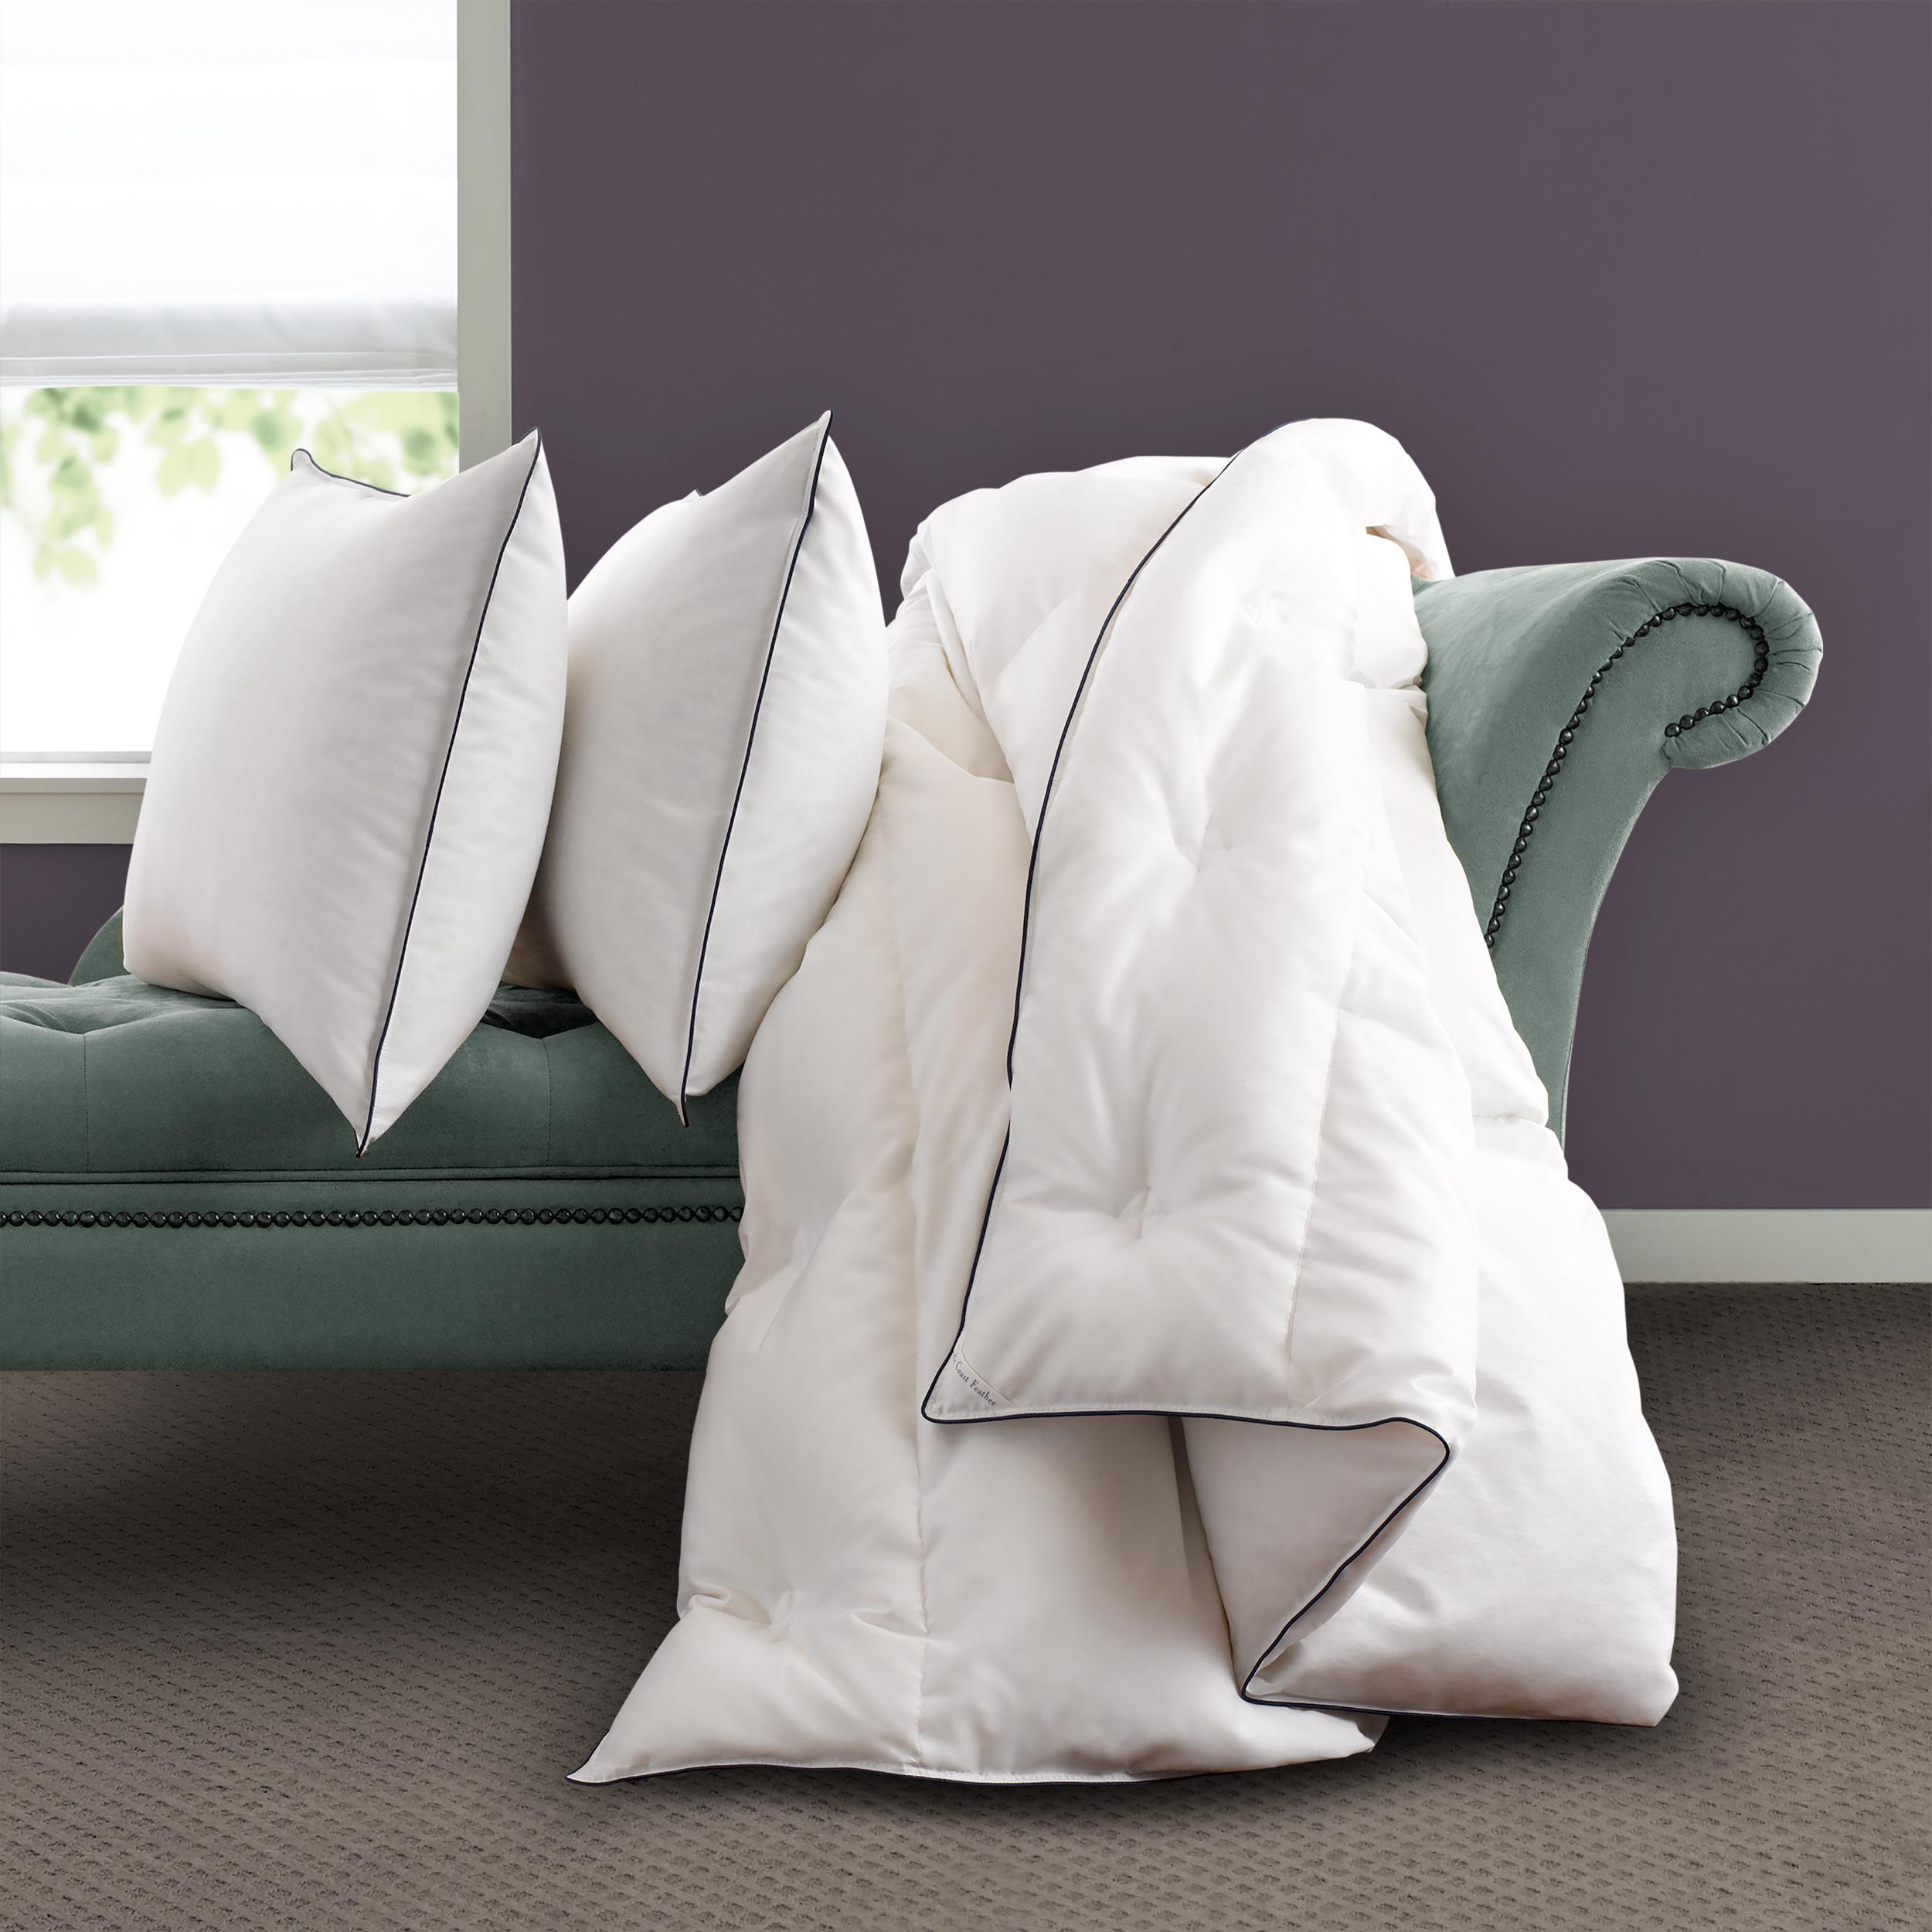 Shop AllerRest Pillow and Comforter Set